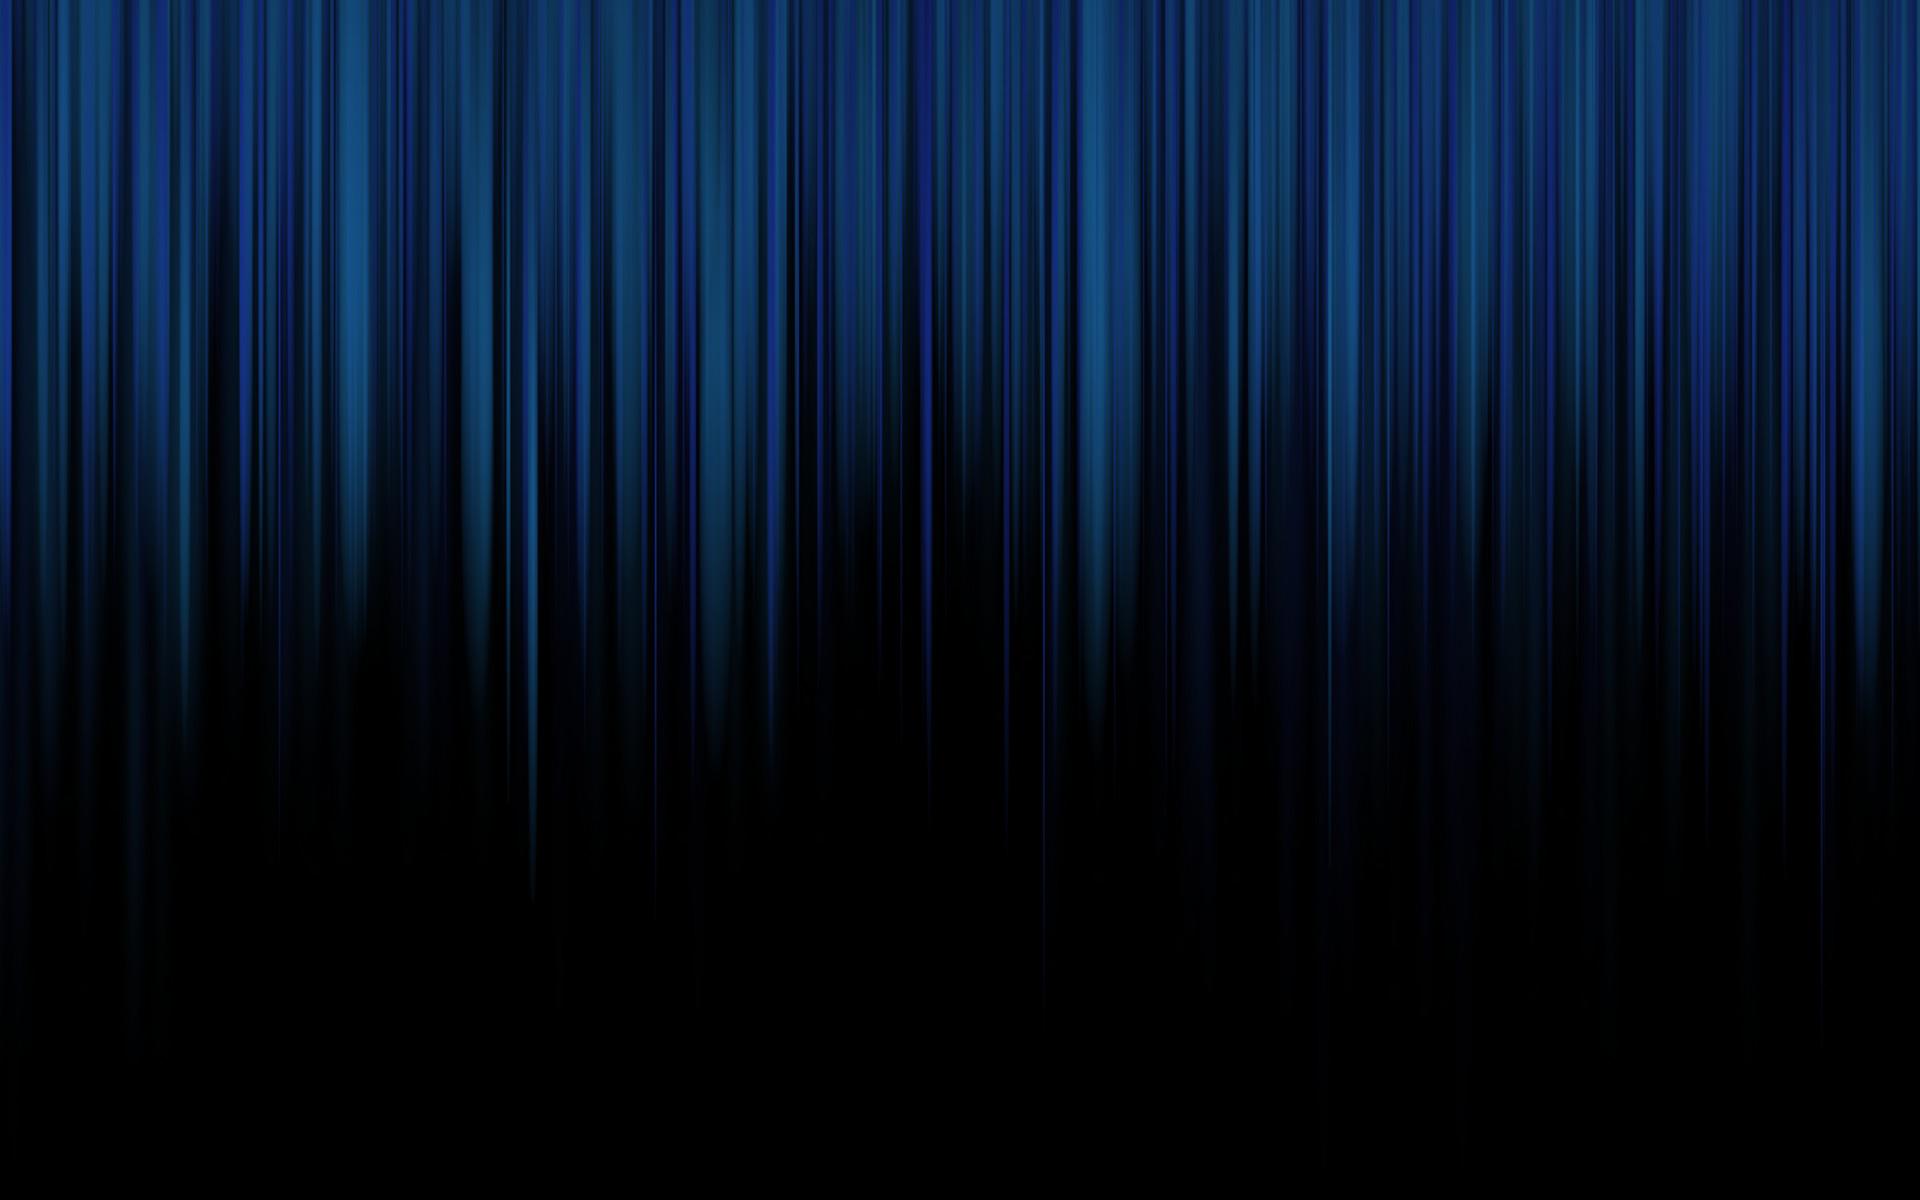 Dark Blue Wallpaper (80 Wallpapers)